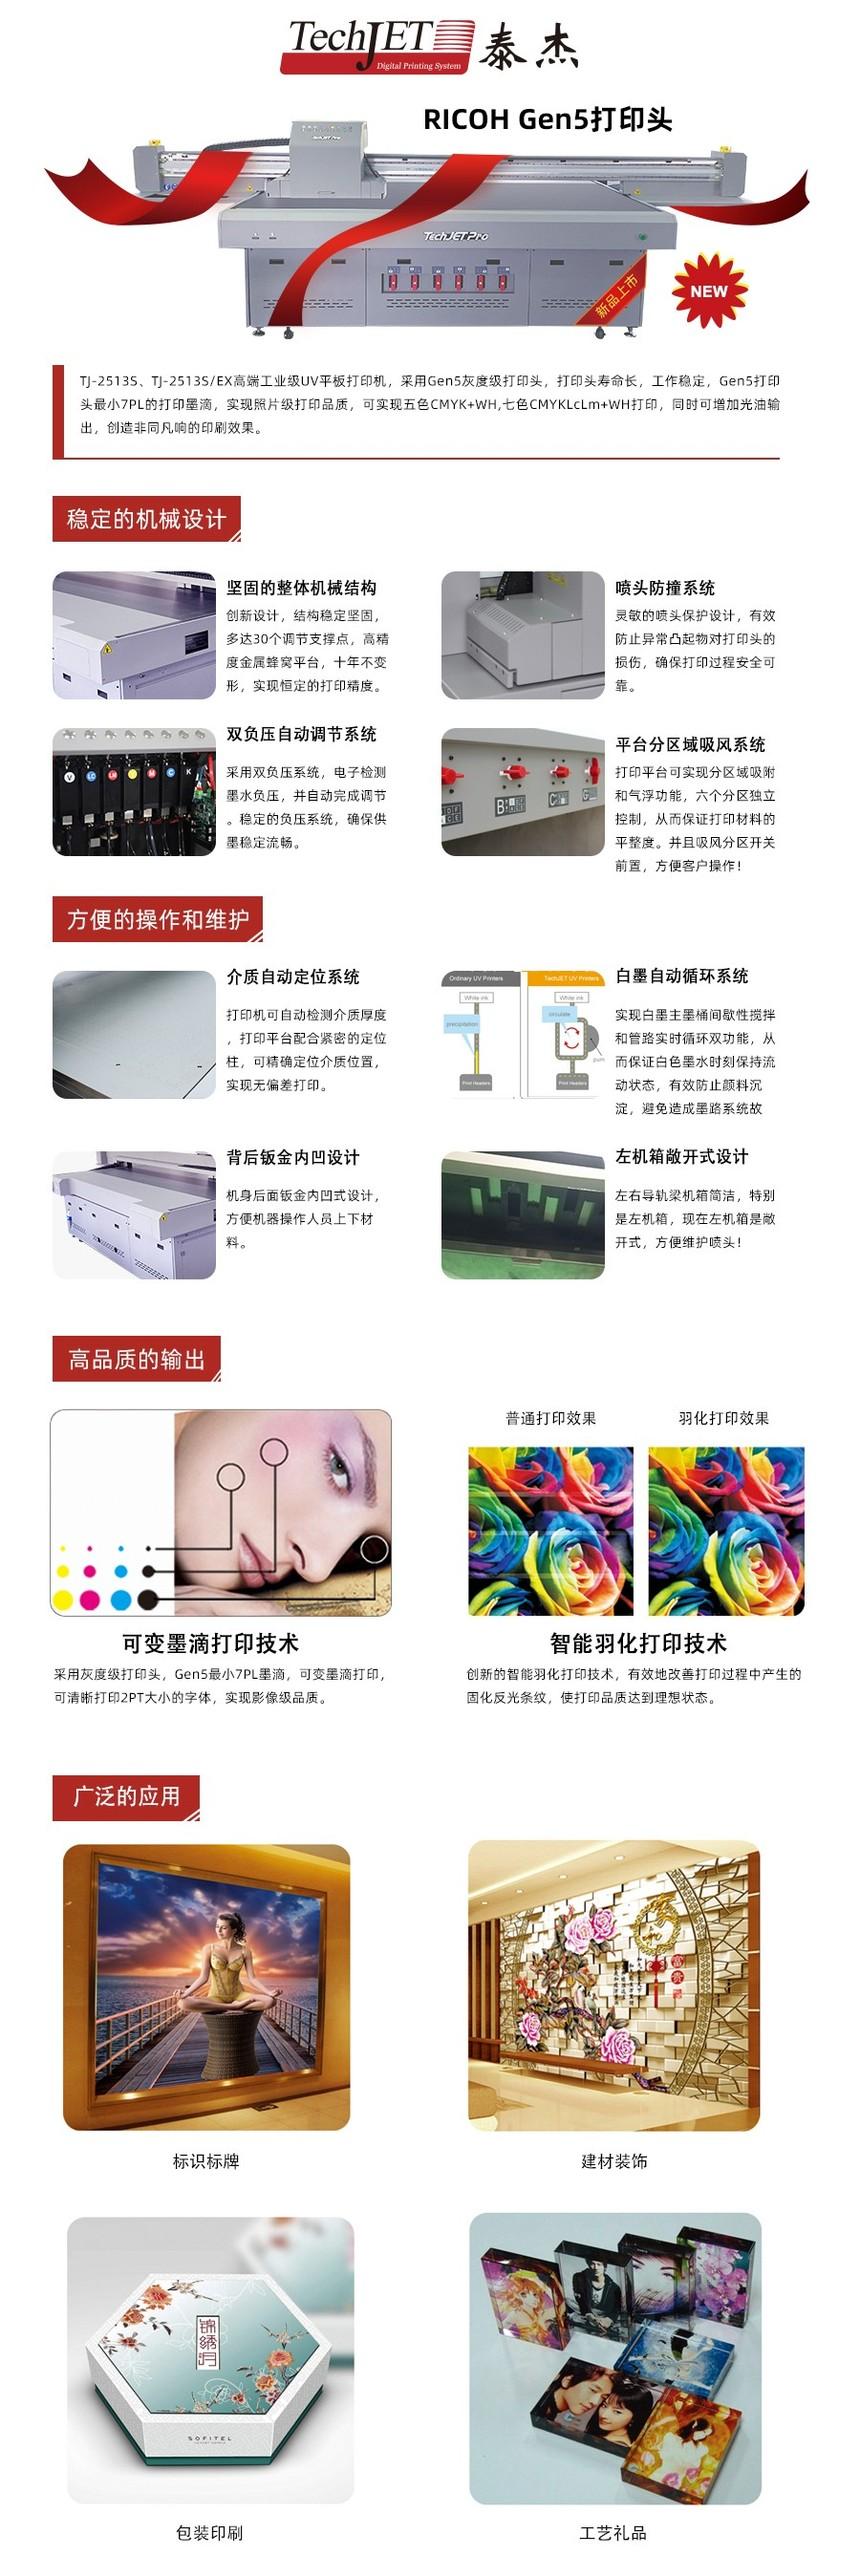 TJ-2513S和2513SEX中文产品说明.jpg